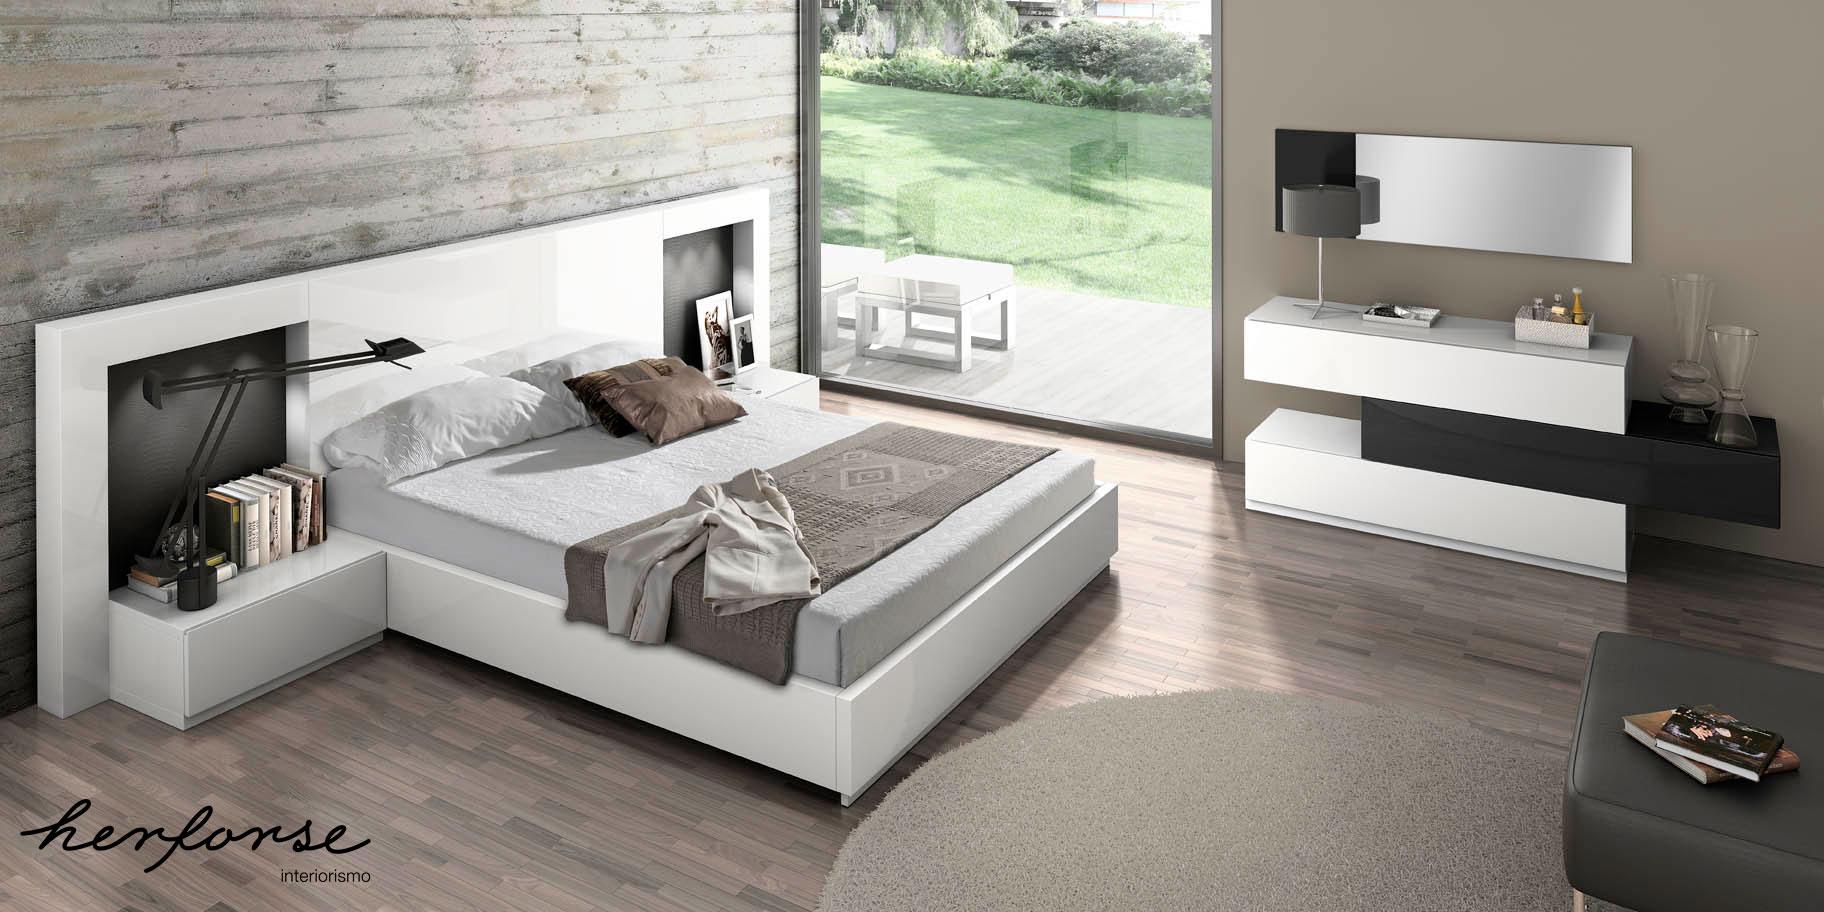 Modernos vanguardia dormitorios herforseinteriorismo - Fotos dormitorios modernos ...